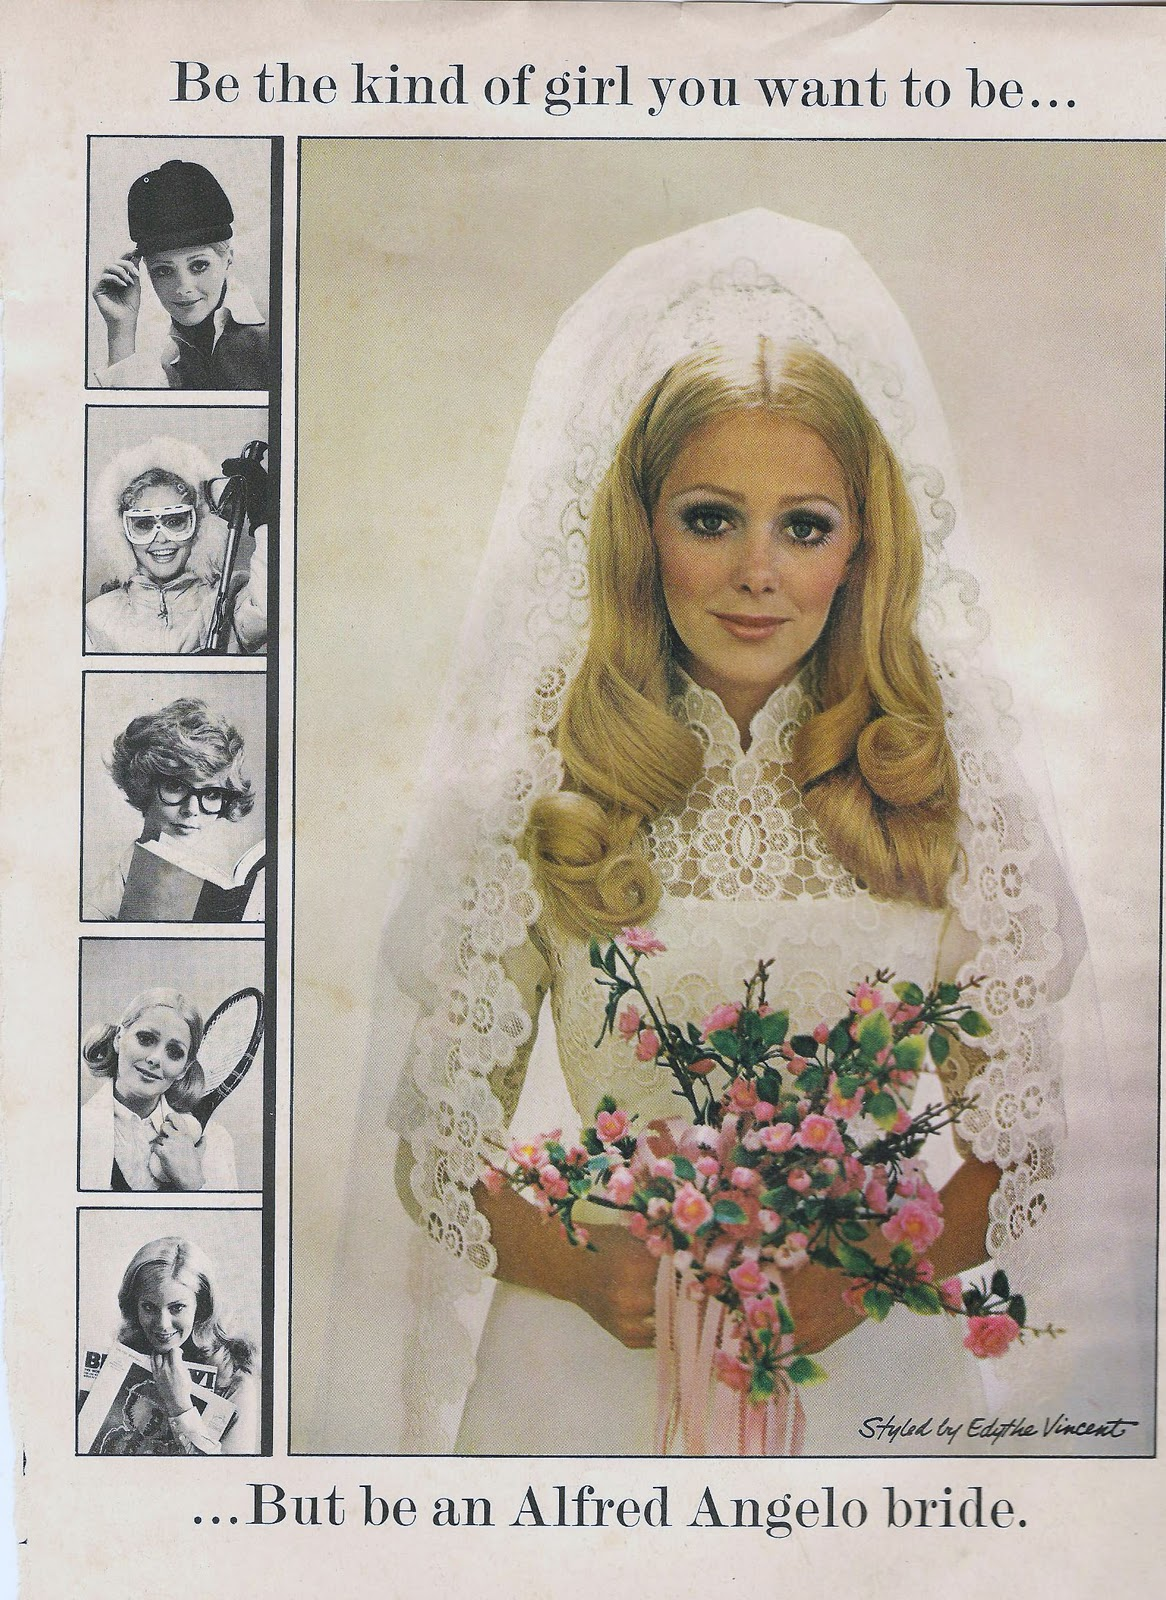 vintage retro wedding dress photos retro wedding dress Vintage Retro Wedding Dress Photos Bride s Spring